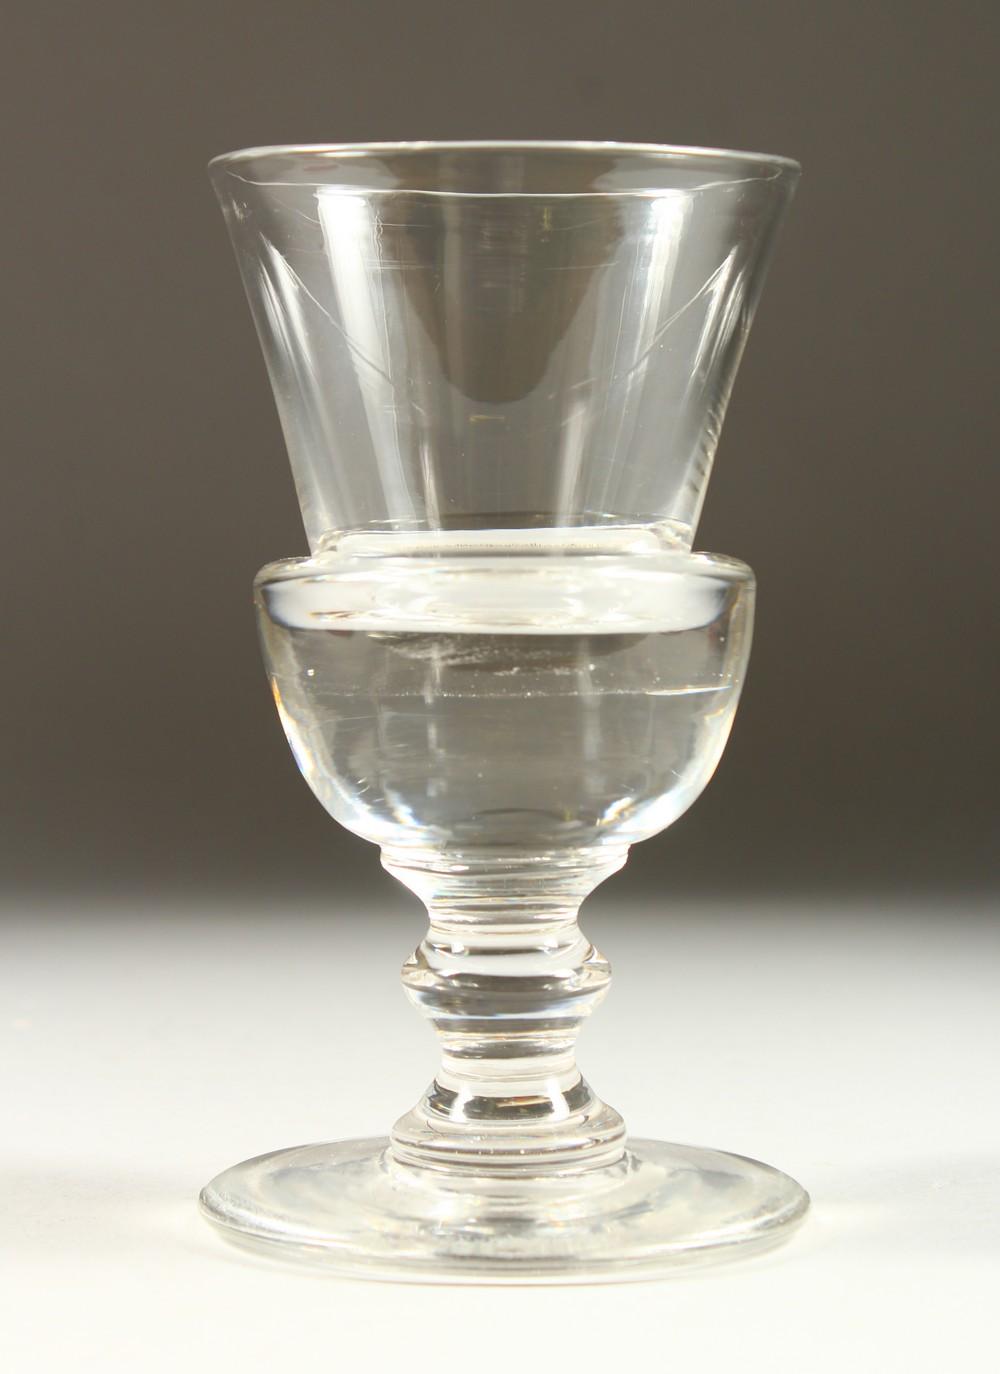 Lot 1047 - A GOOD TRUMPET SHAPED PLAIN GLASS on a large circular base. 7ins high.